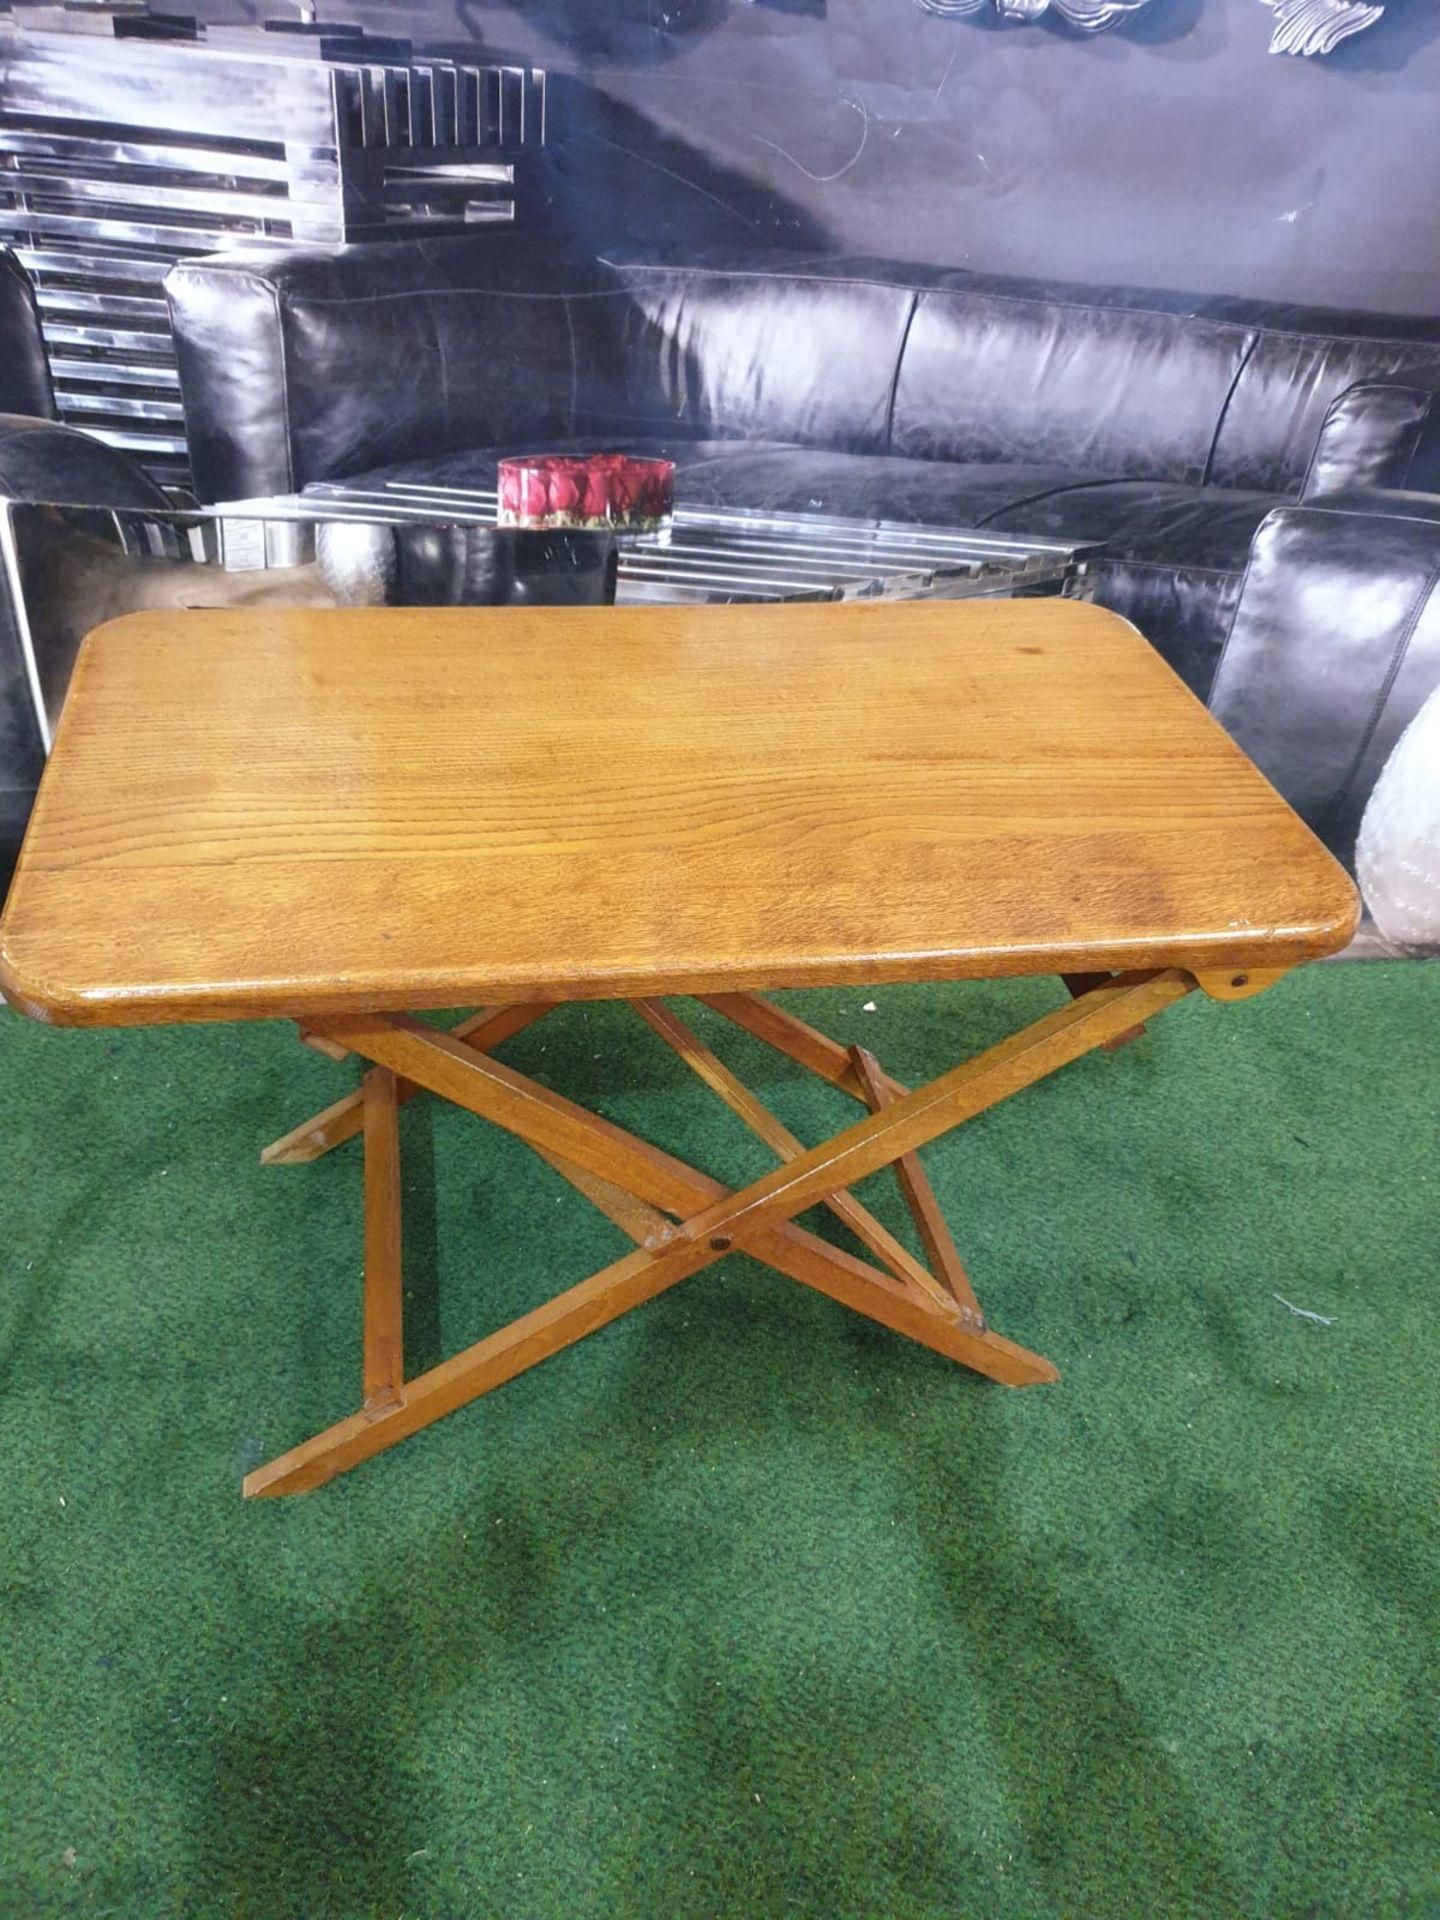 A polished teak folding table 71 x 40 x 4cm - Image 2 of 5